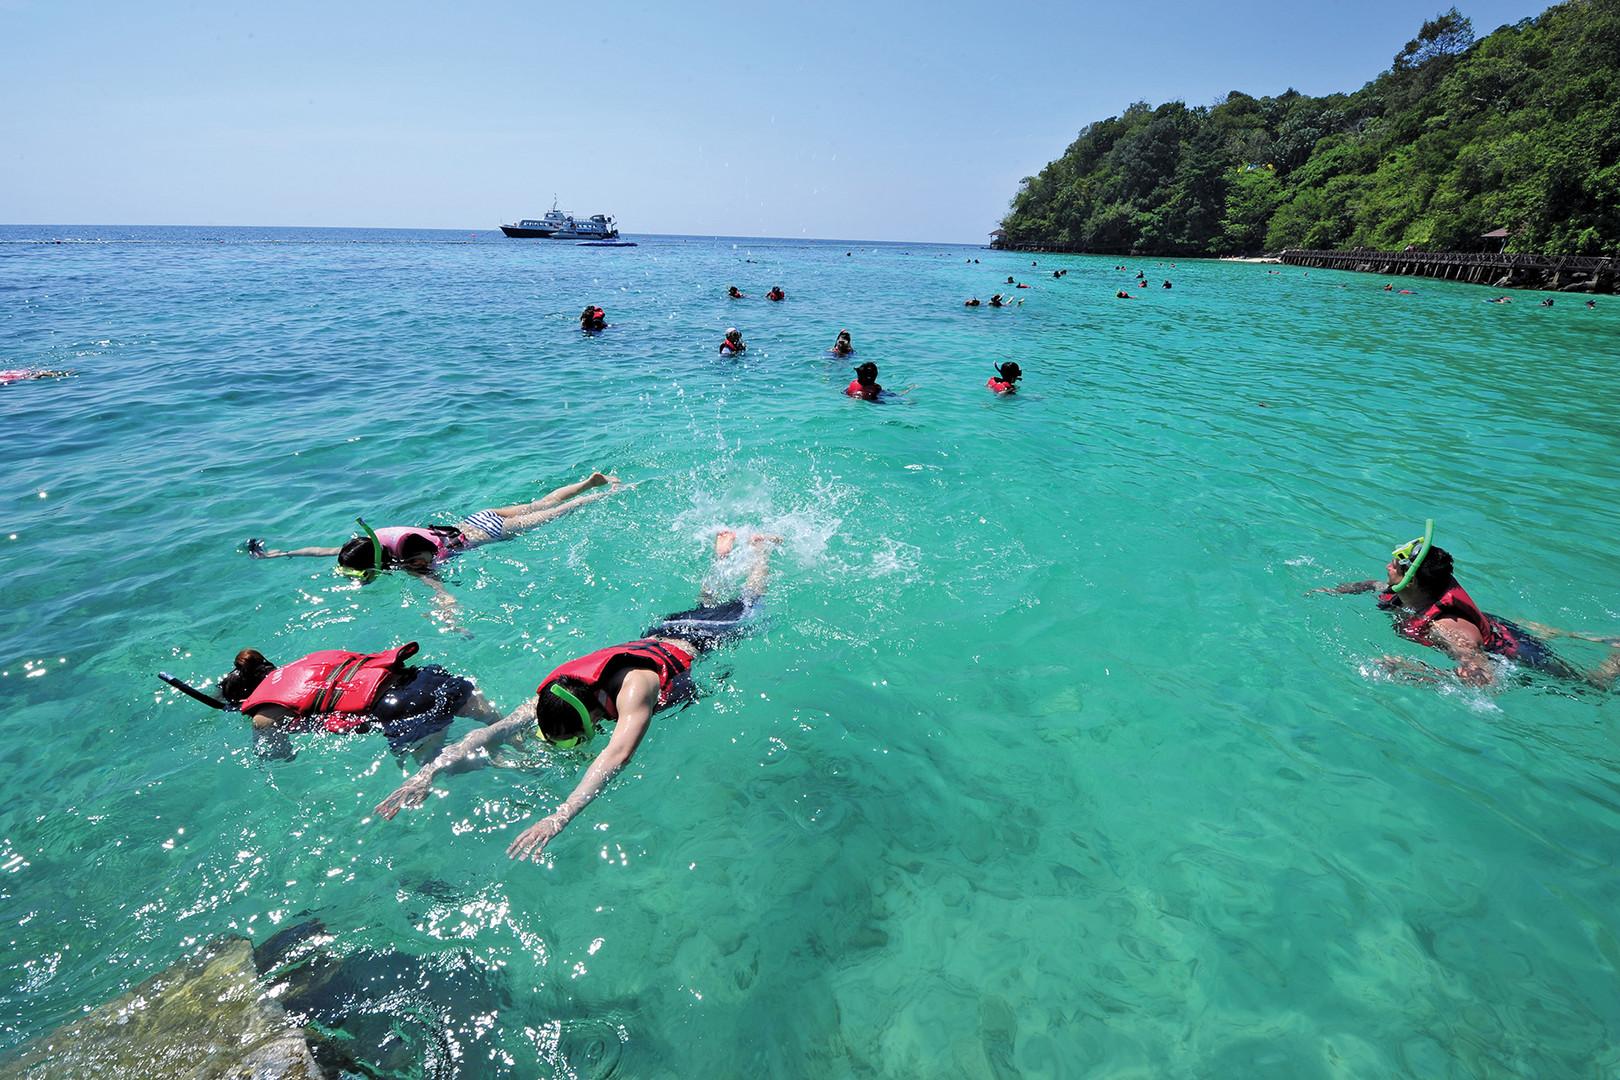 Pulau Payar Marine Park Snorkeling